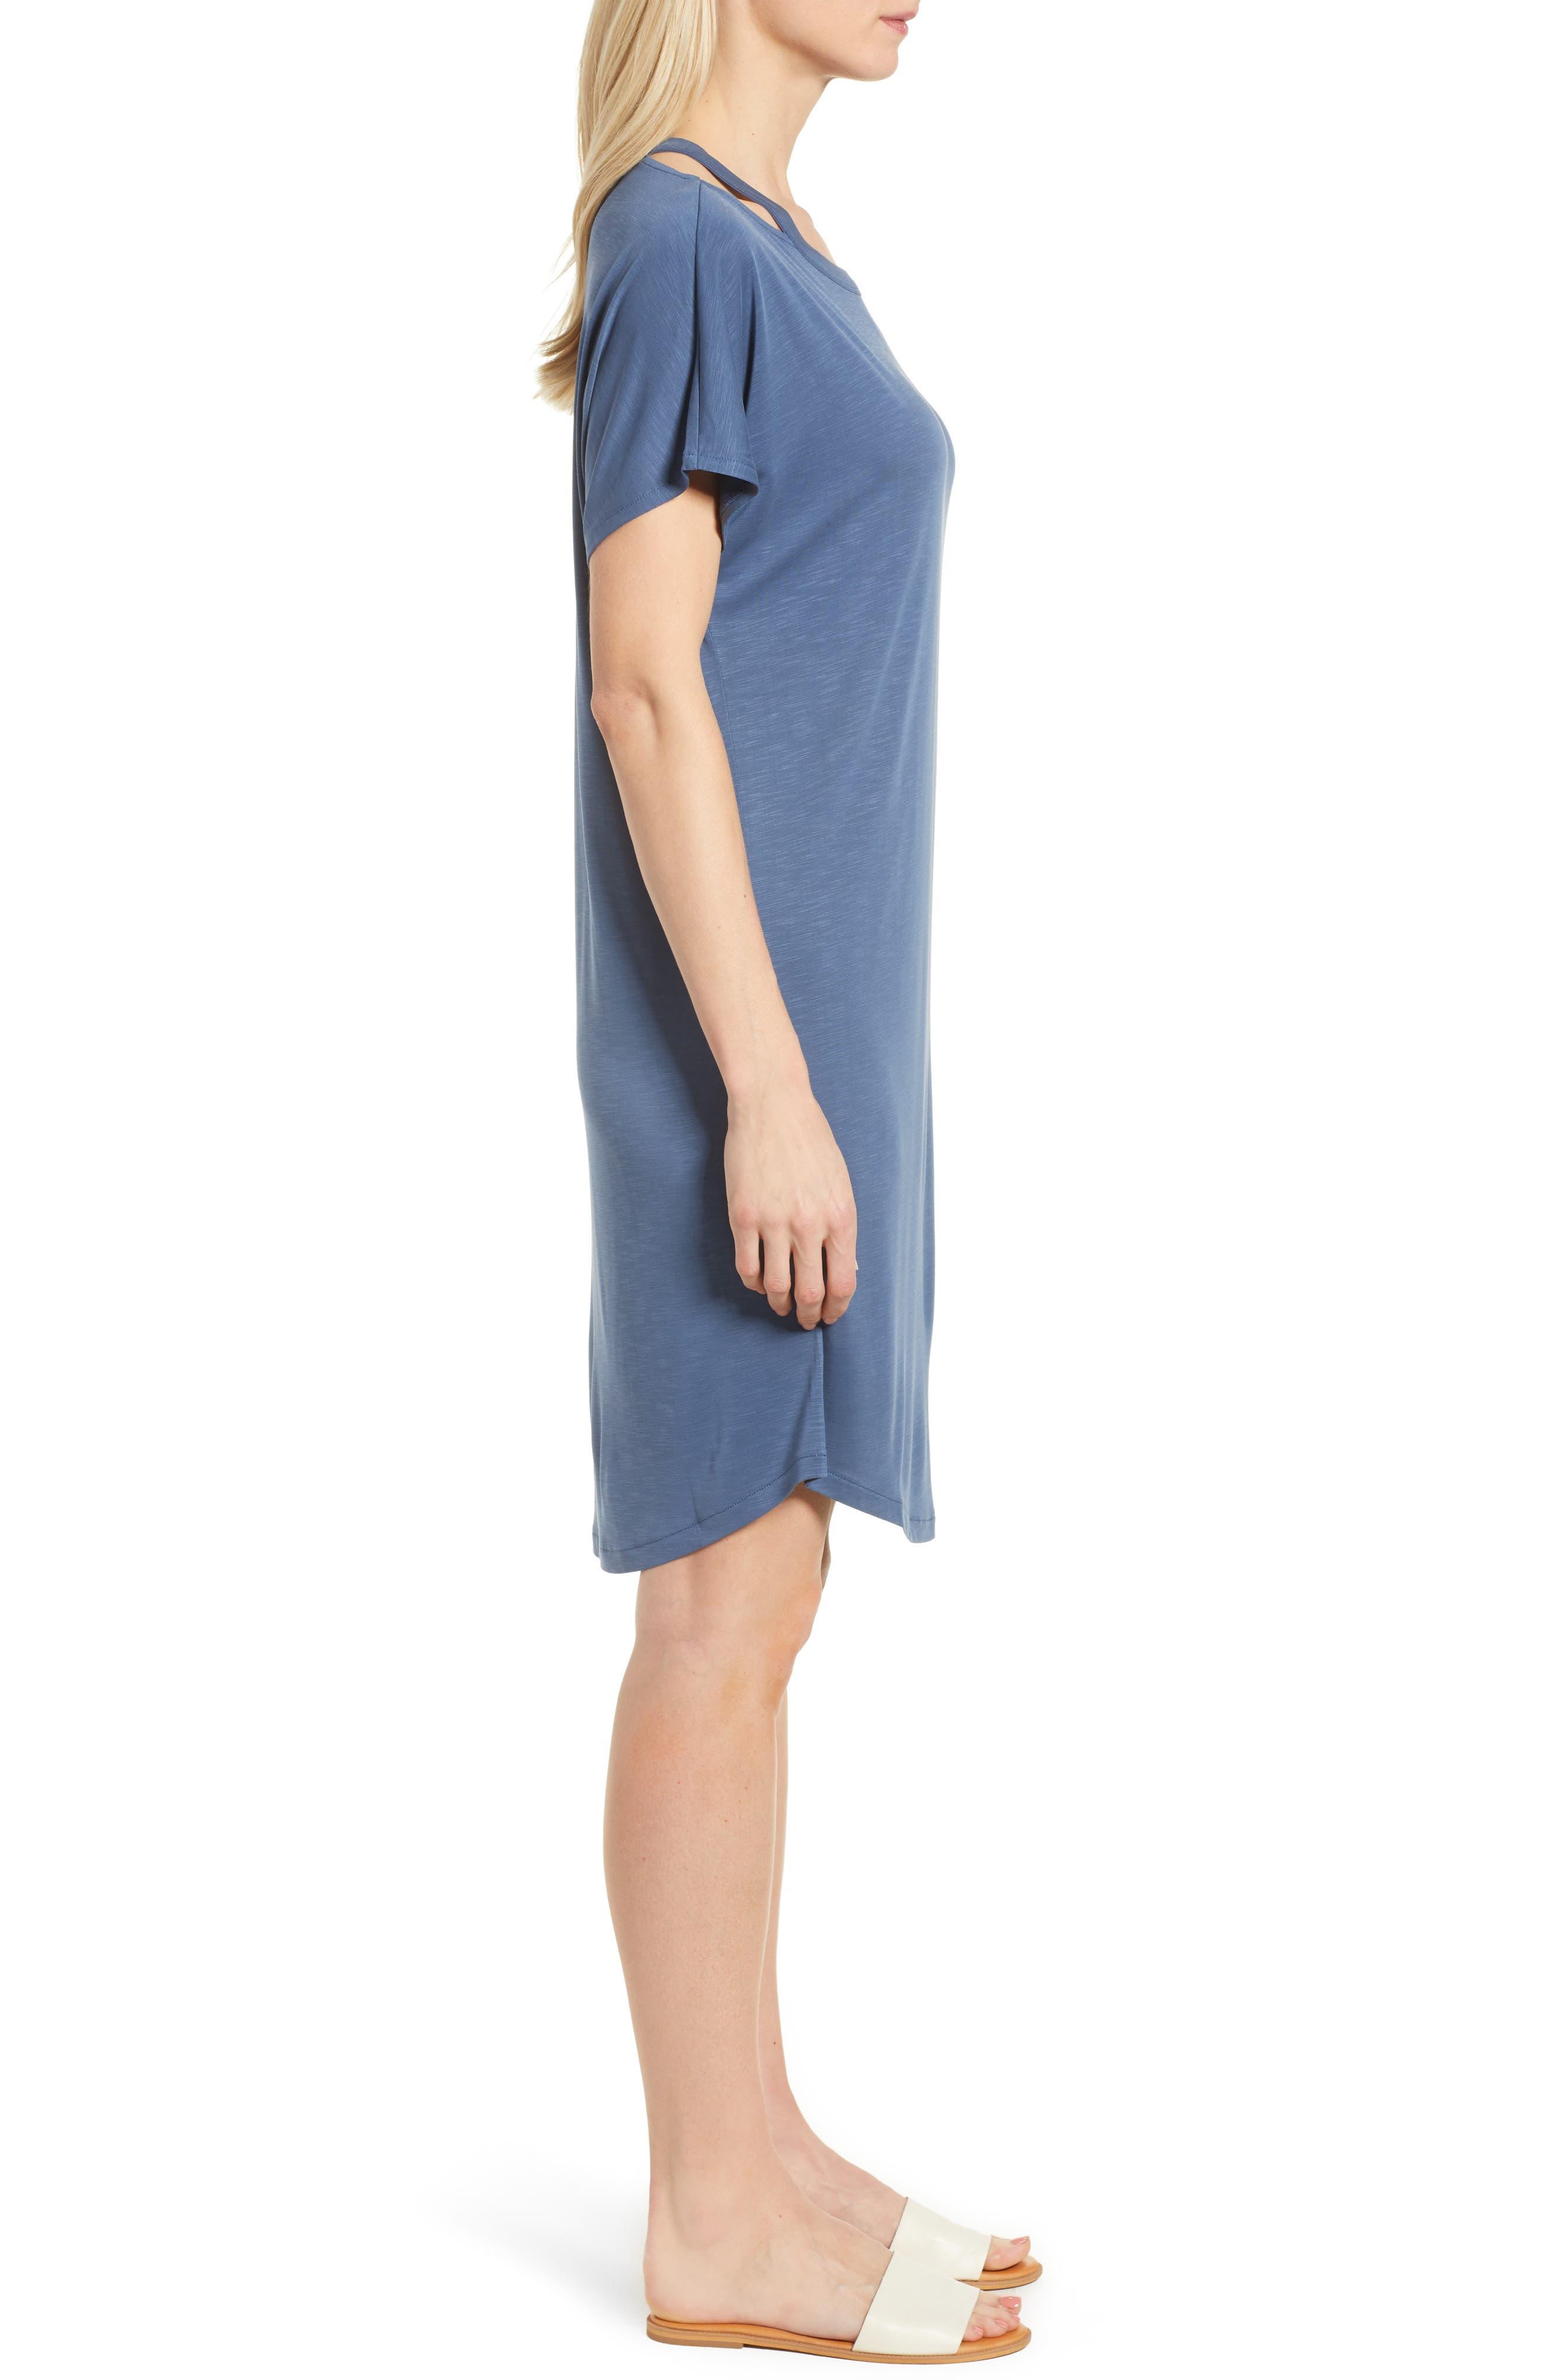 Open Road Dress,                             Alternate thumbnail 3, color,                             490